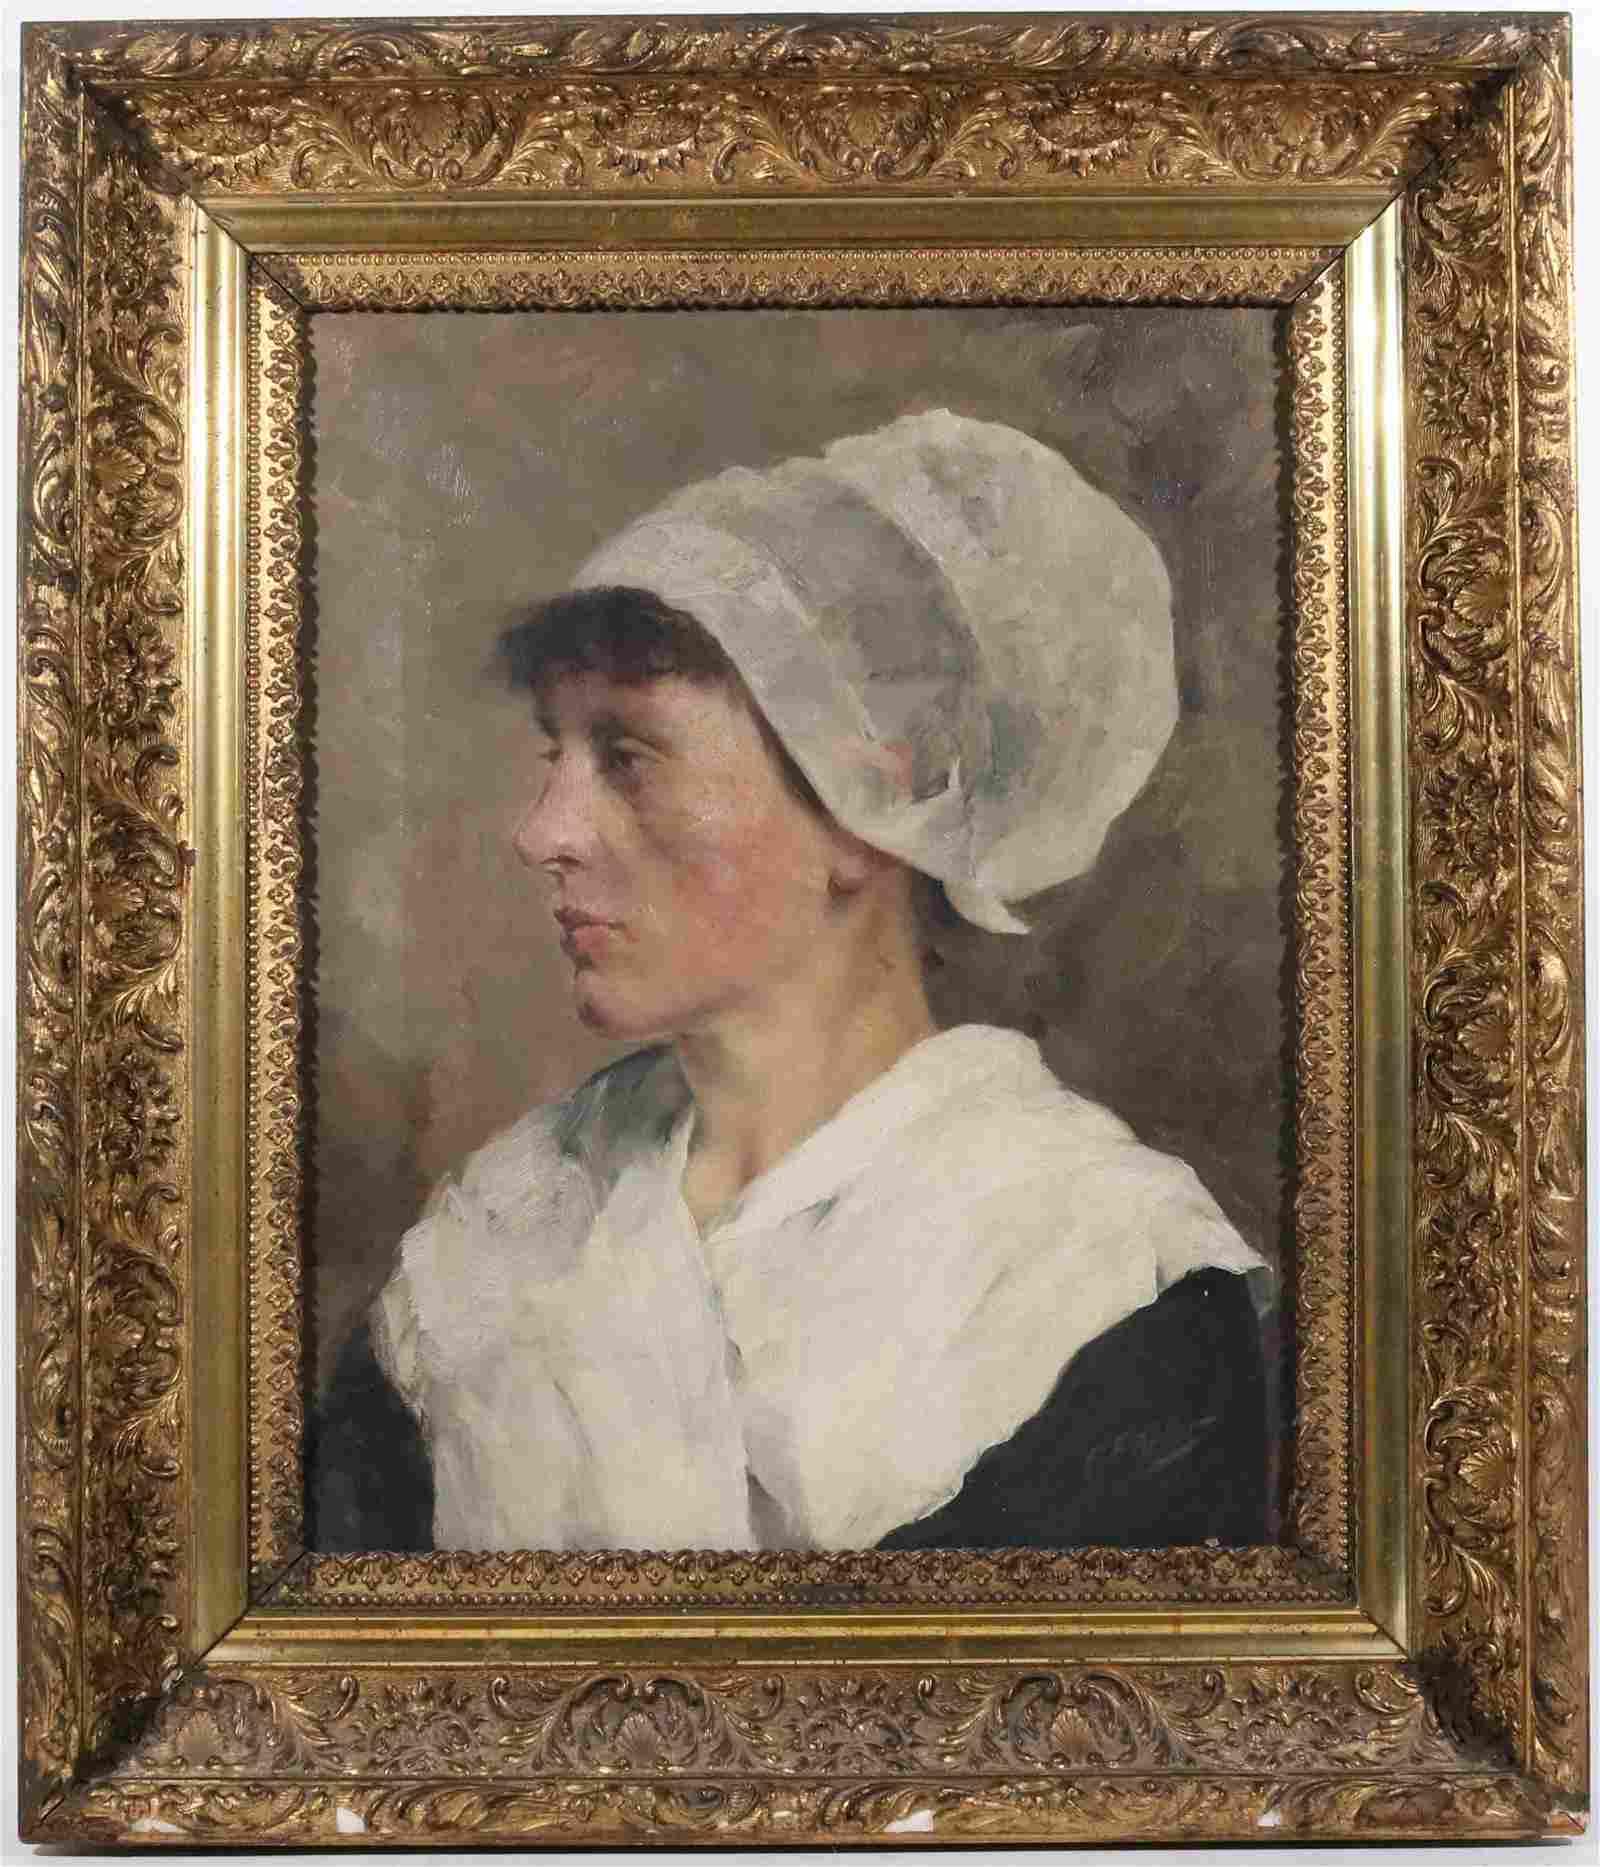 C.F. Keller, Oil on Canvas, Portrait of Woman